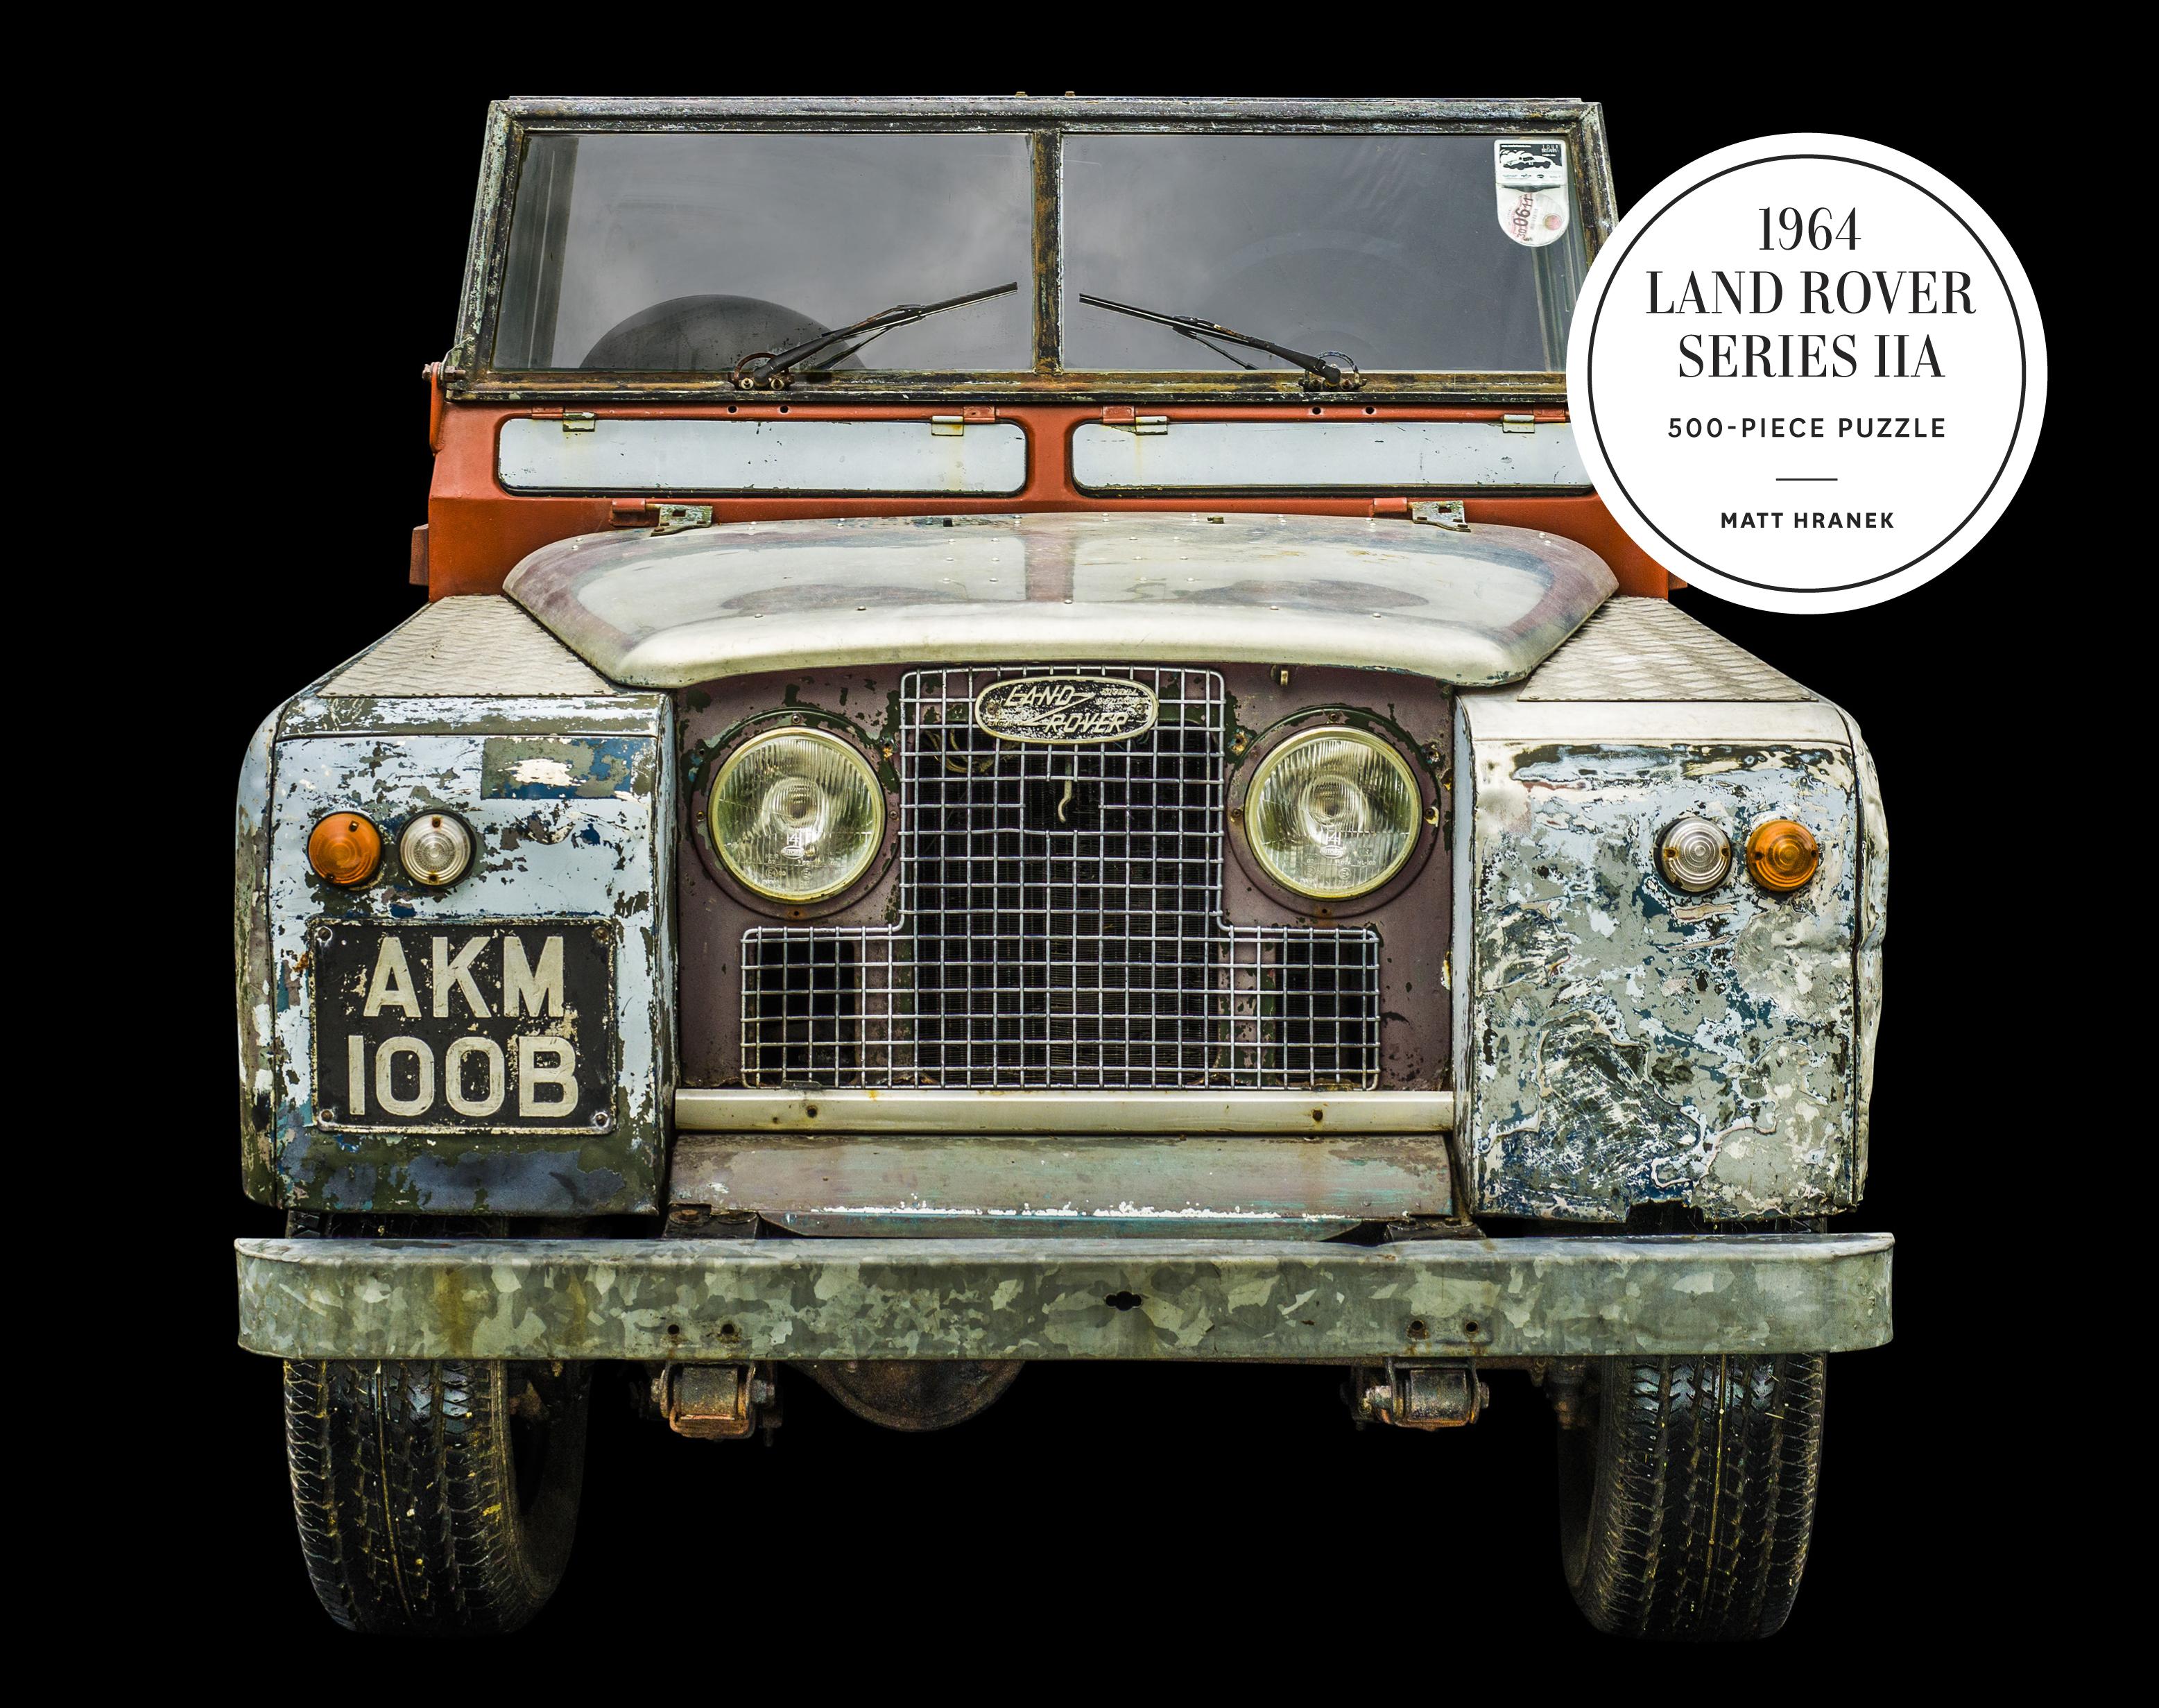 1964 Land Rover Series IIA 500-Piece Puzzle